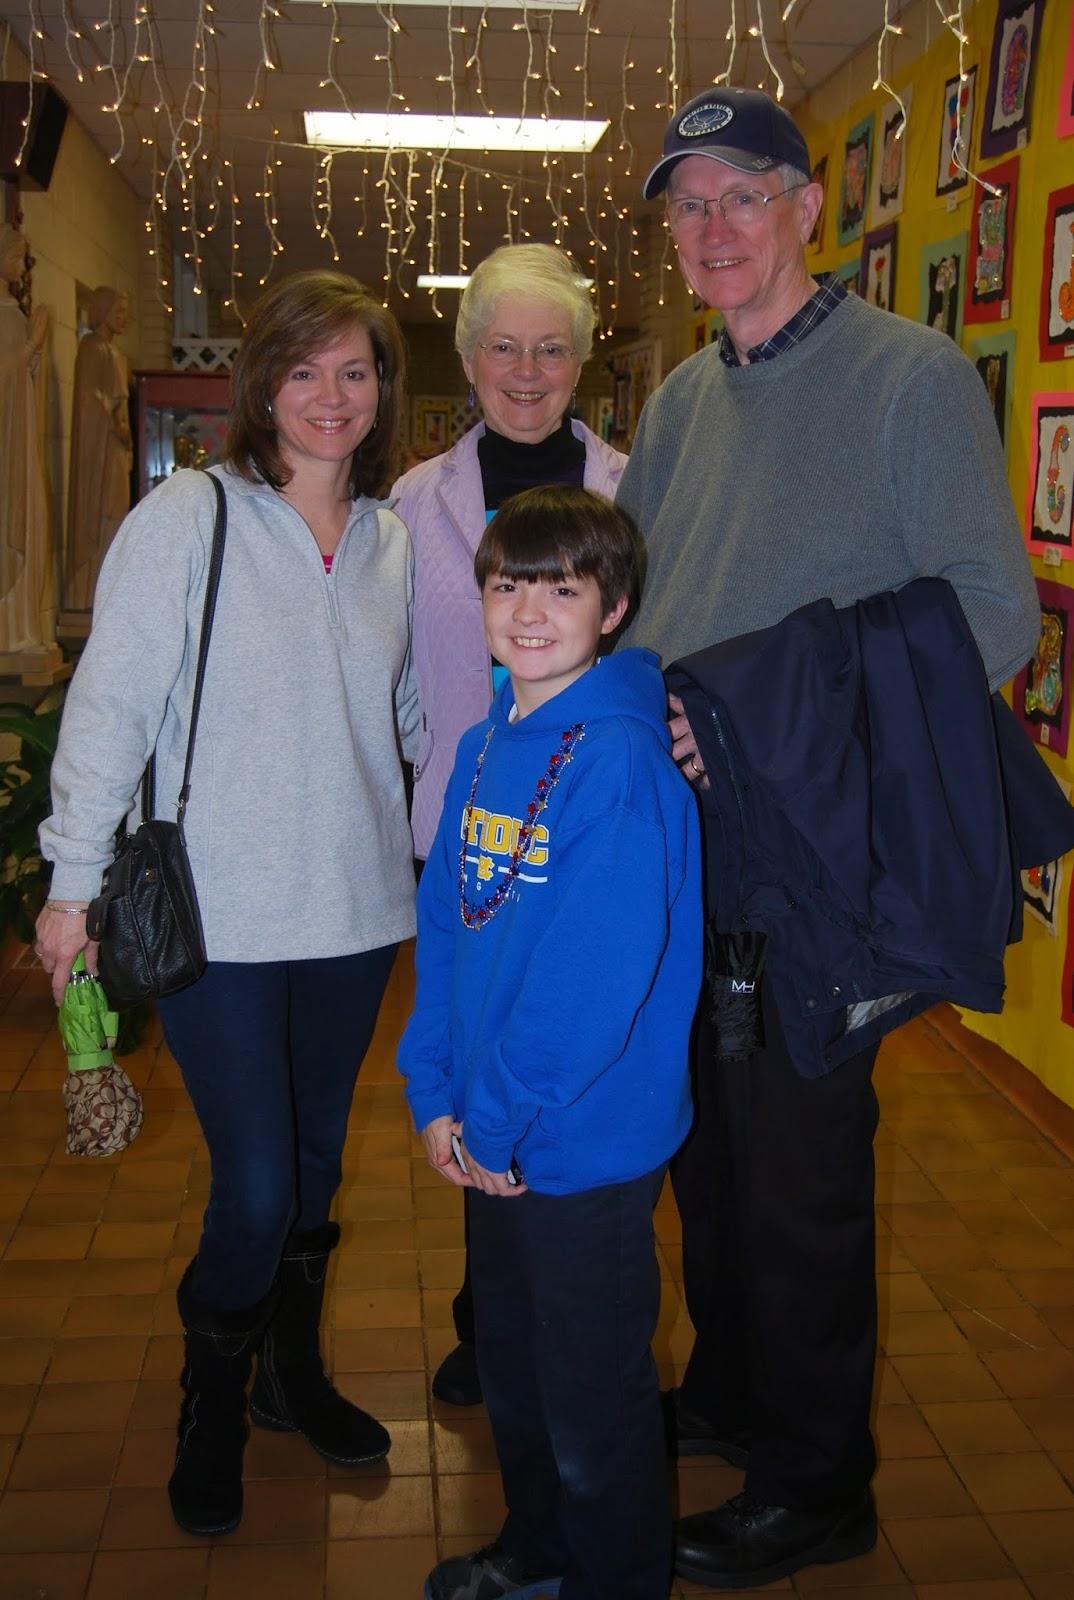 Montgomery Catholic Preparatory School celebrates Catholic Schools Week January 27 - 31 2